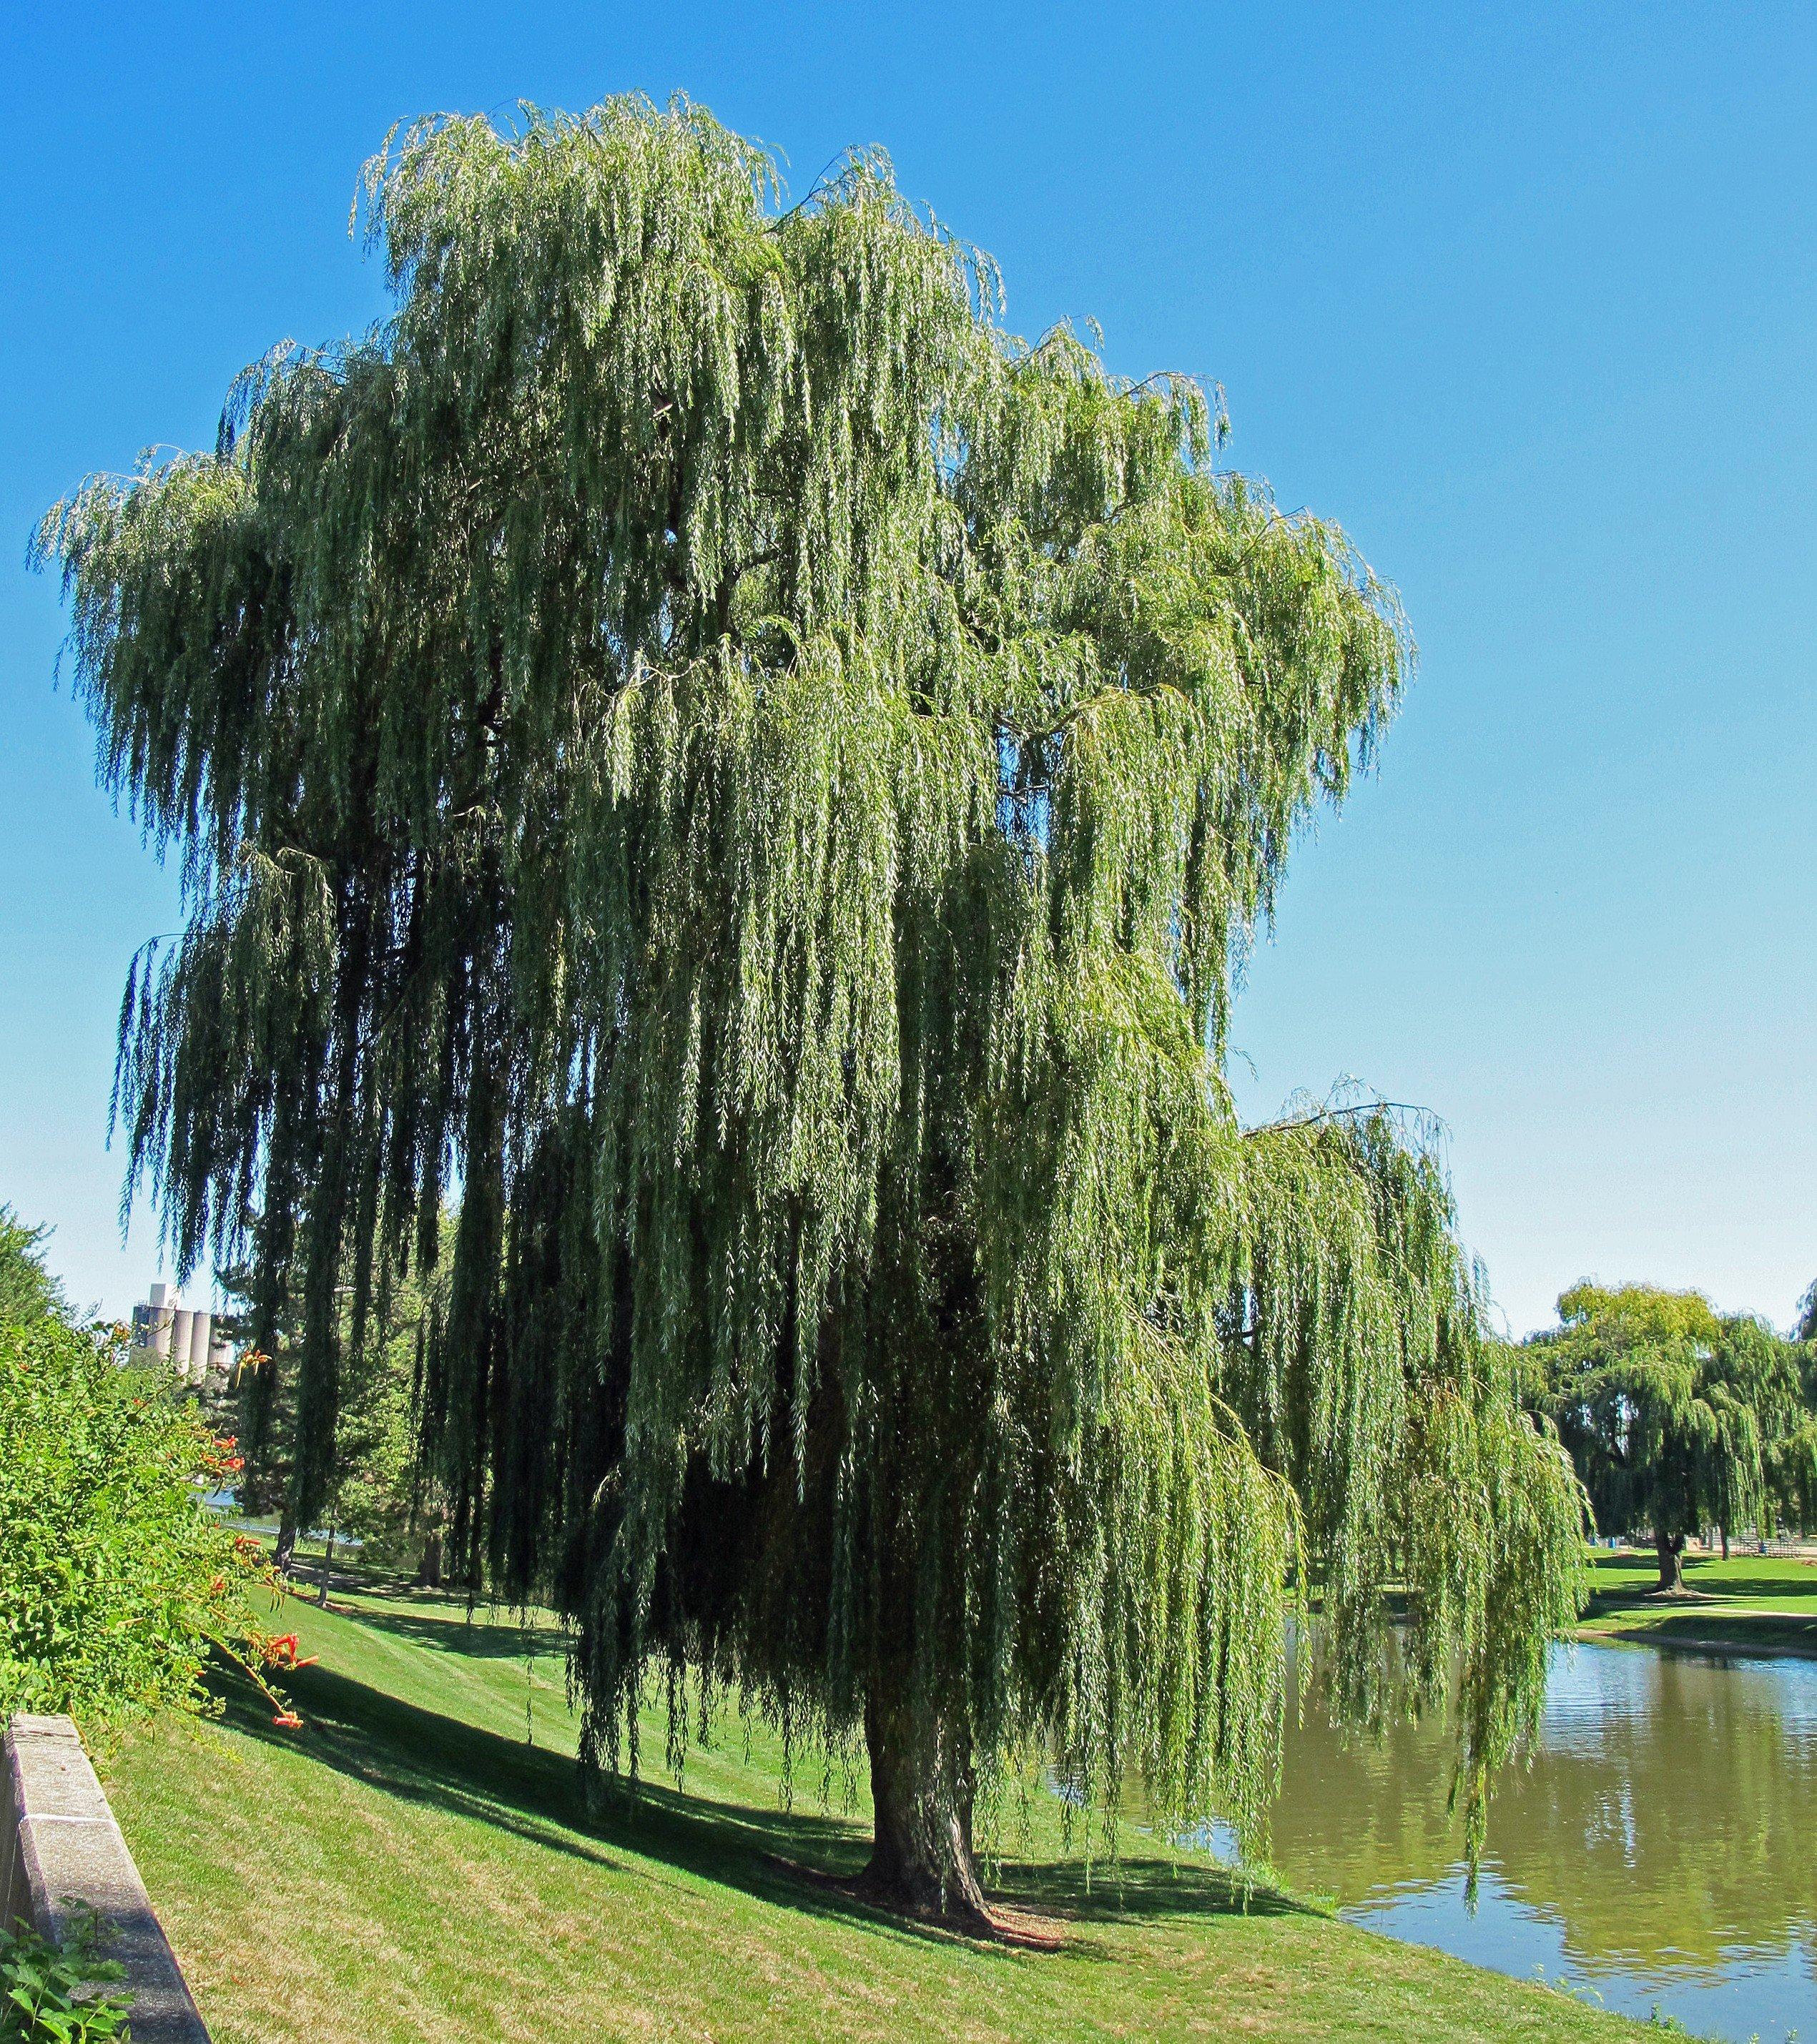 Willow Tree 2541x2859